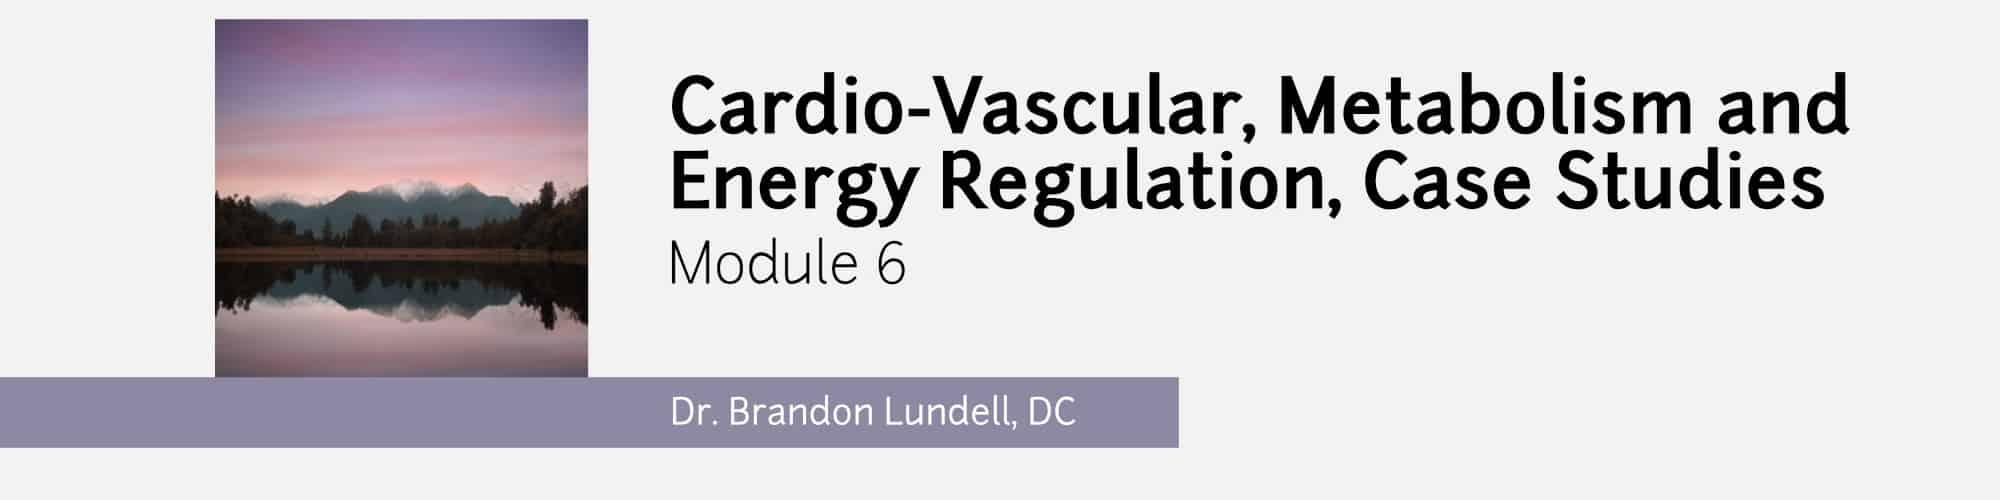 Module 6 - Cardio-Vascular, Metabolism and Energy Regulation, Case Studies